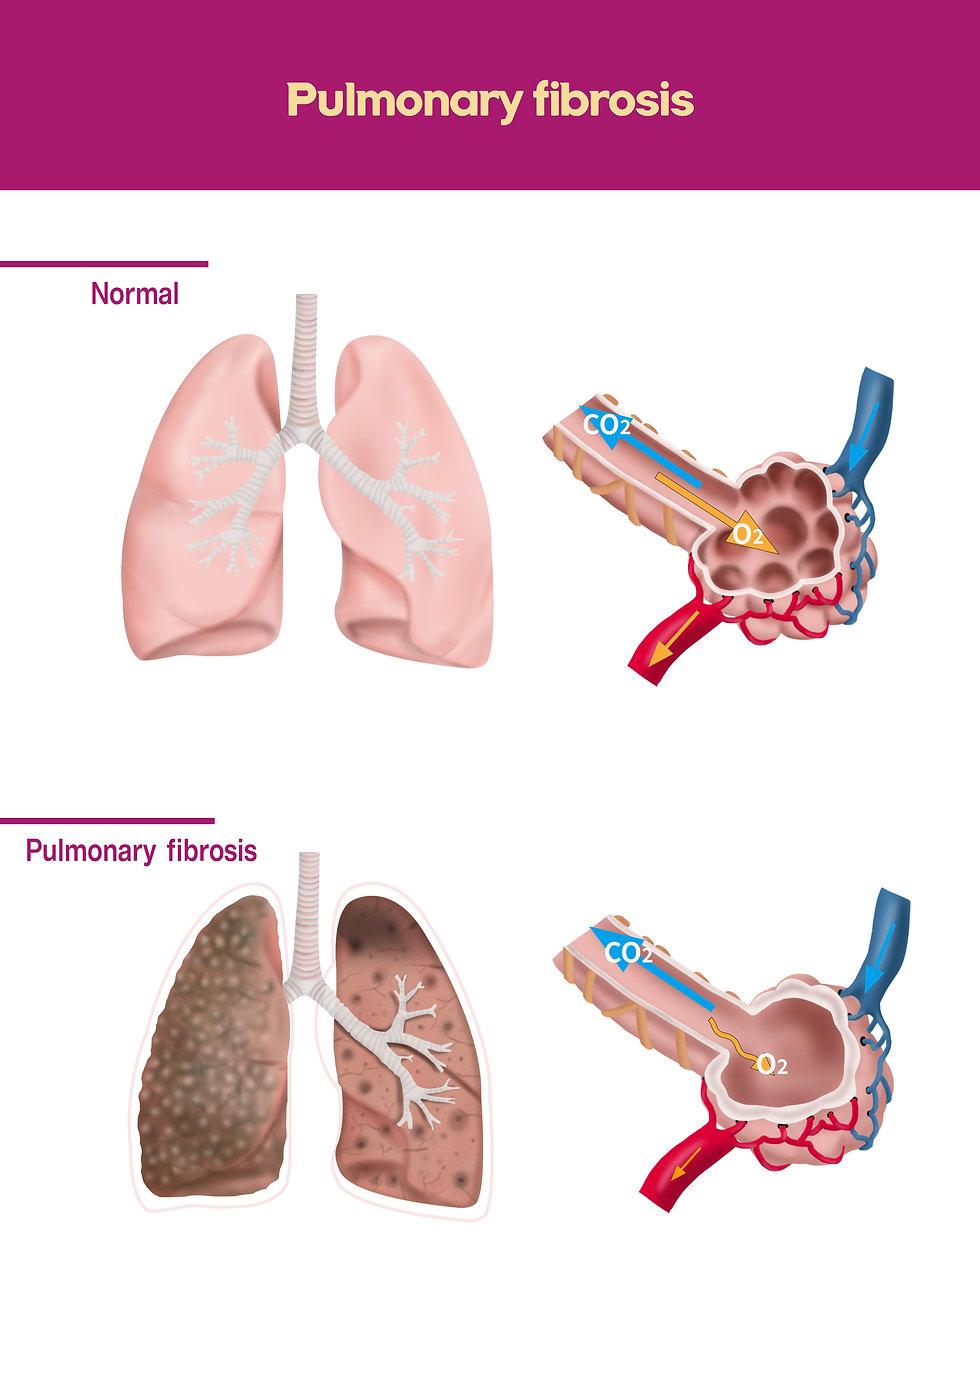 PULMONARY FIBROSIS.jpg